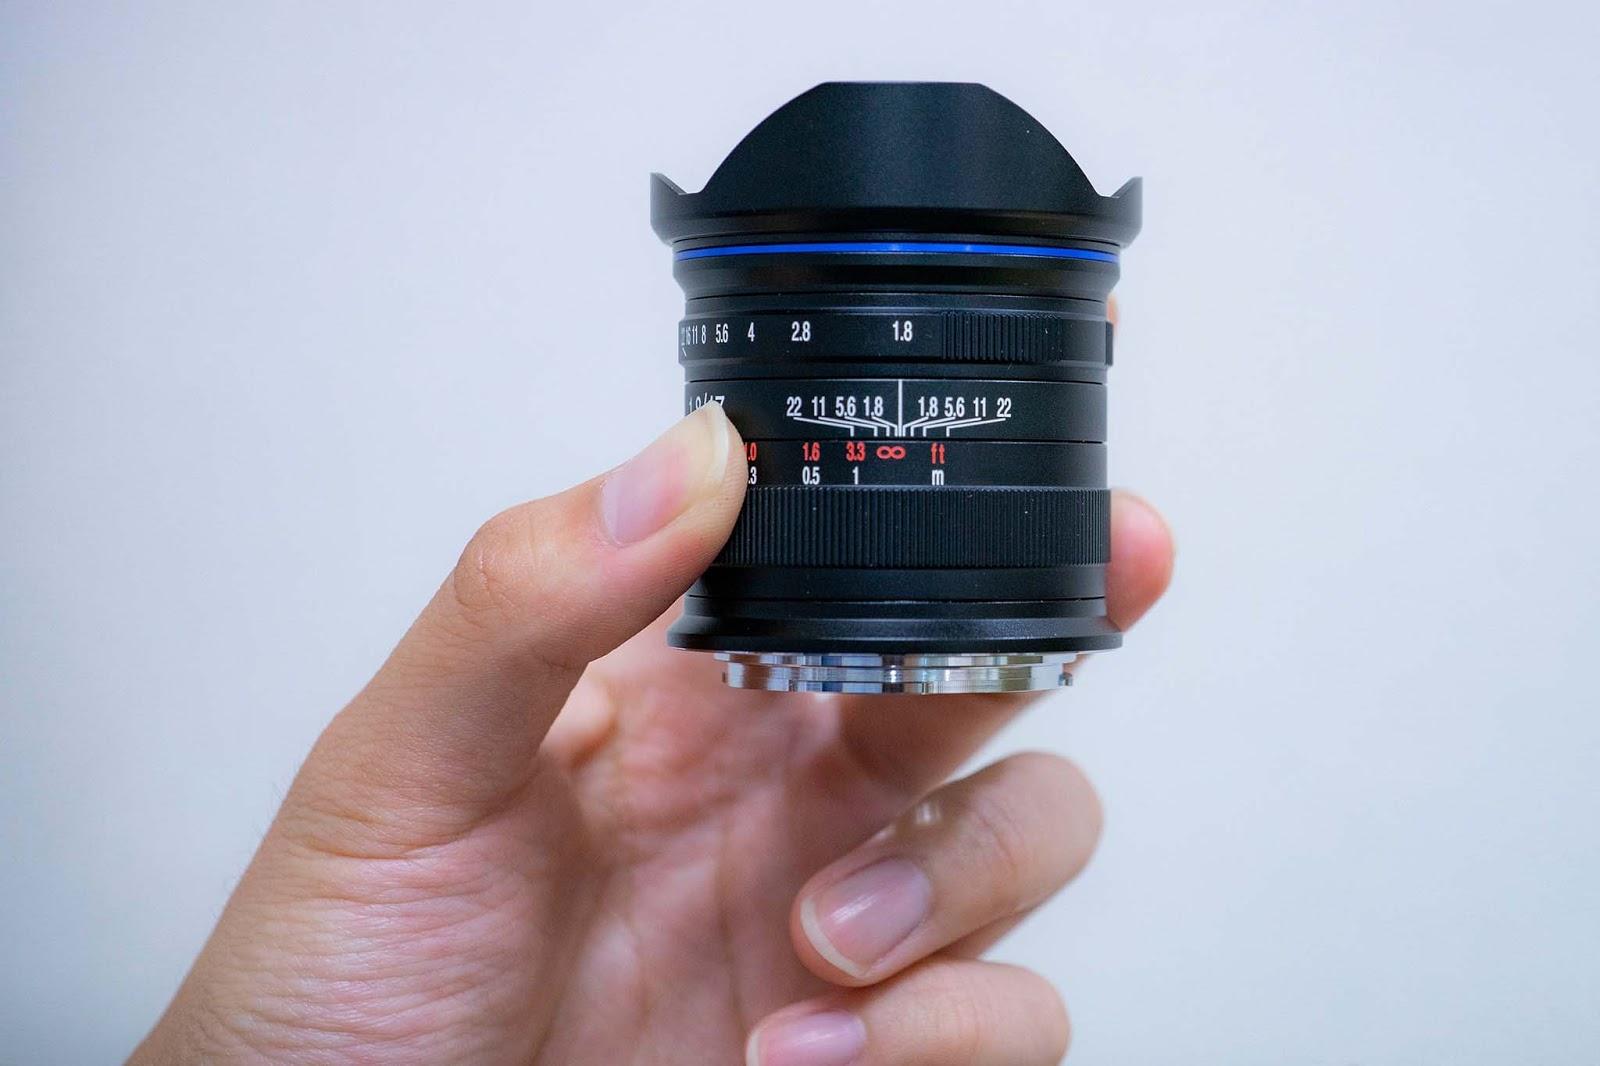 Laowa 17mm f/1.8